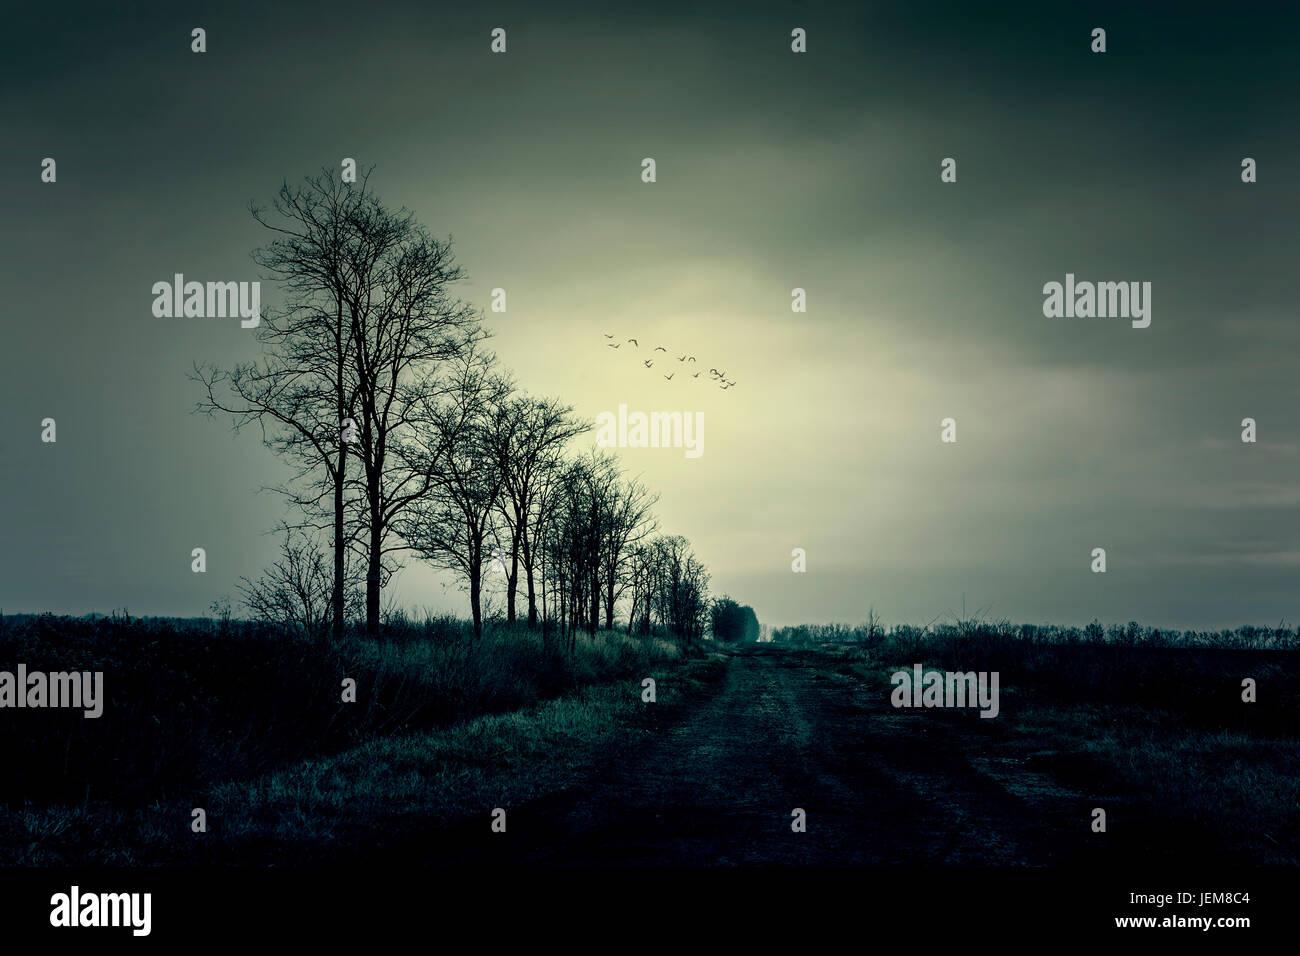 Foto atmosférica de árboles secos Imagen De Stock